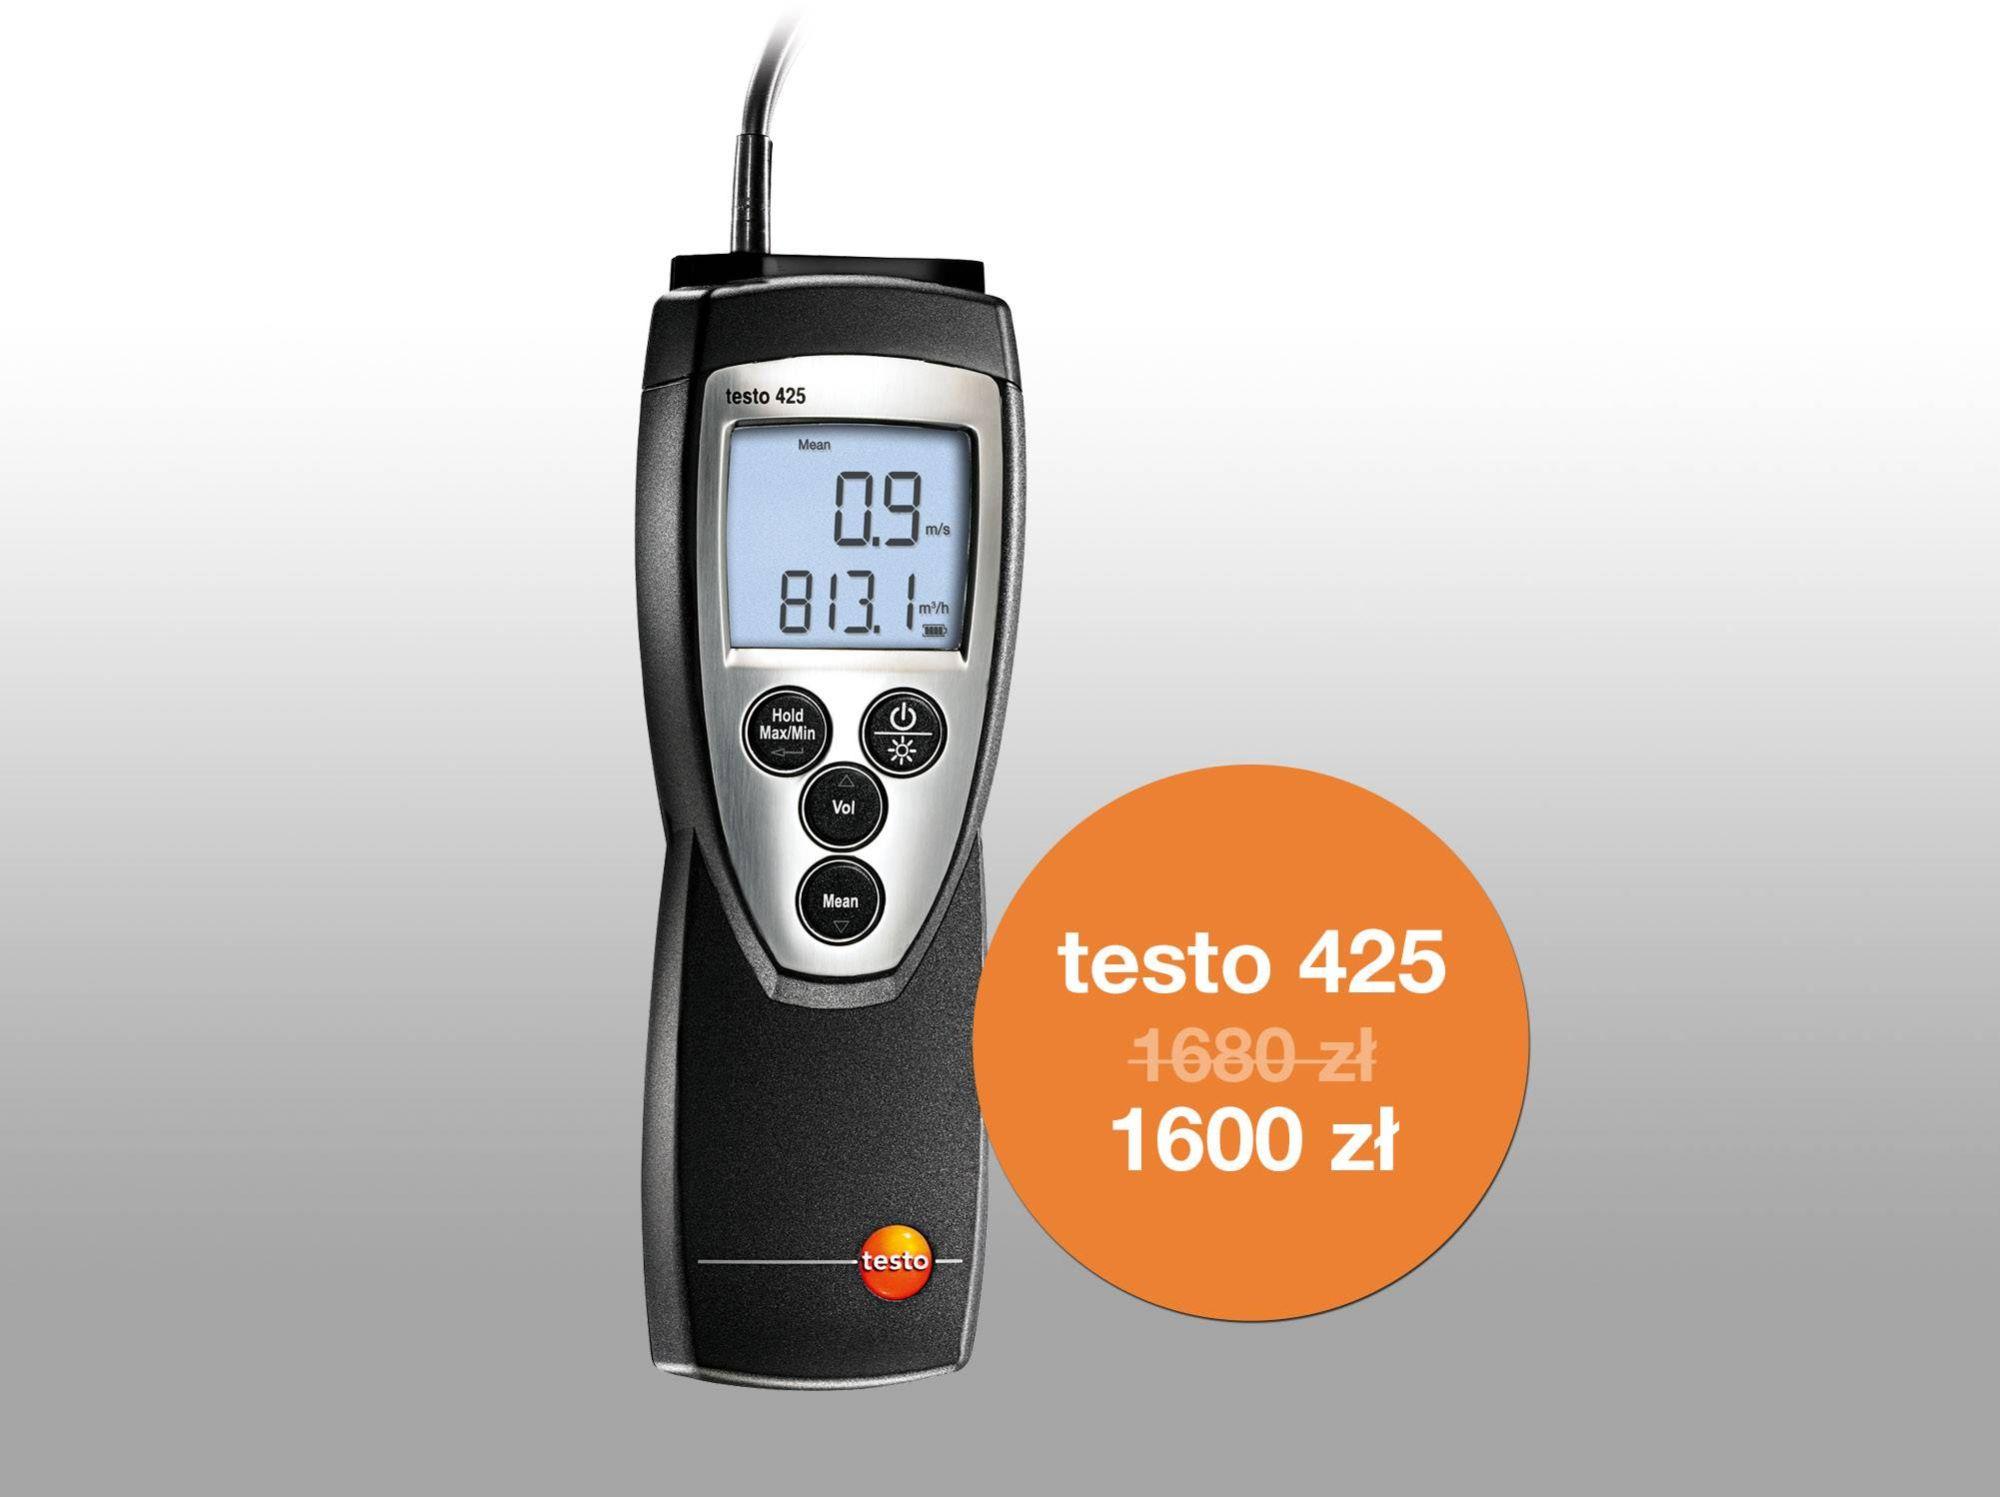 testo-425-anemometer.jpg